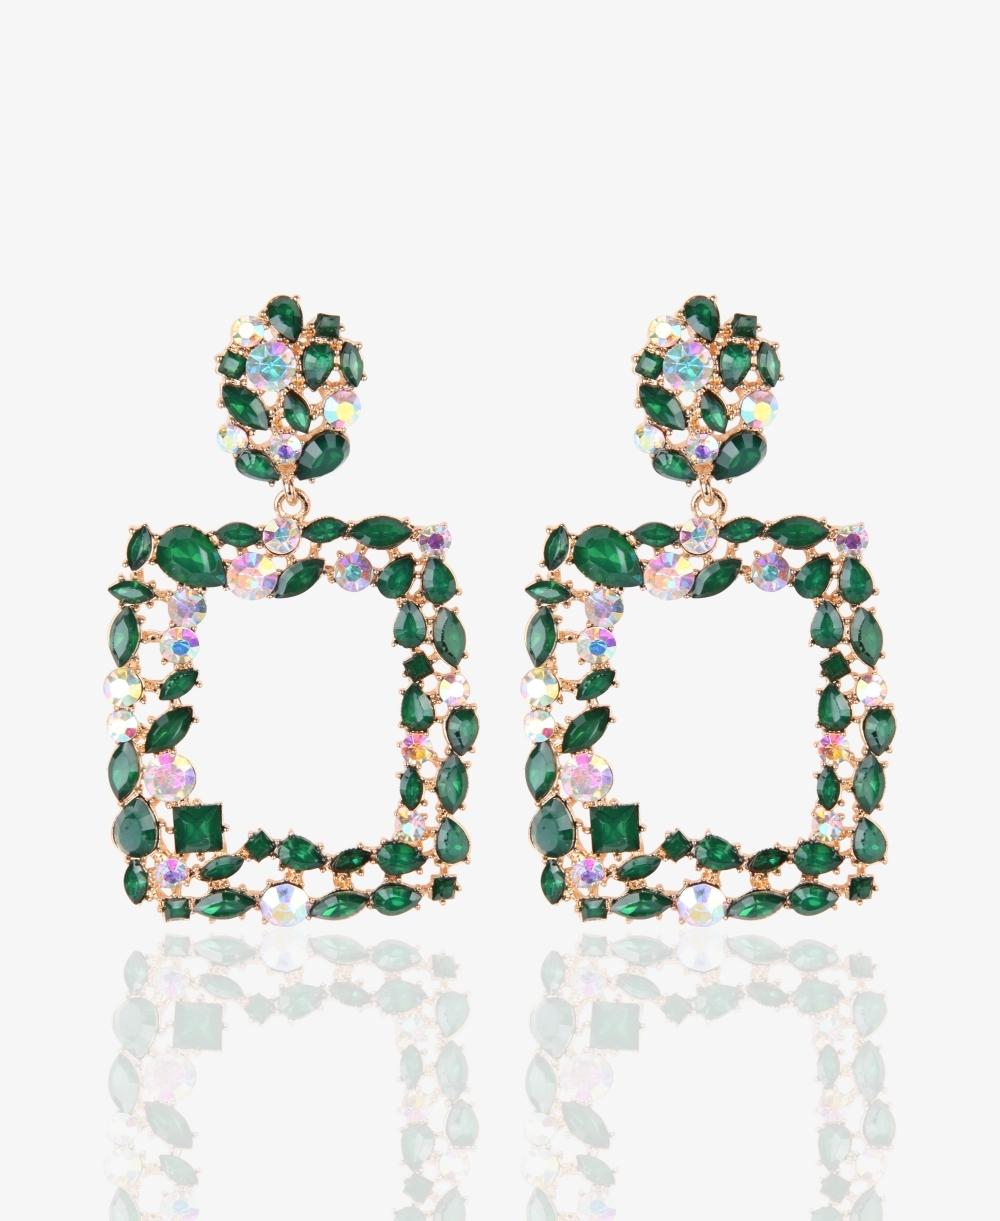 Crystal Rectangular Statement Earrings